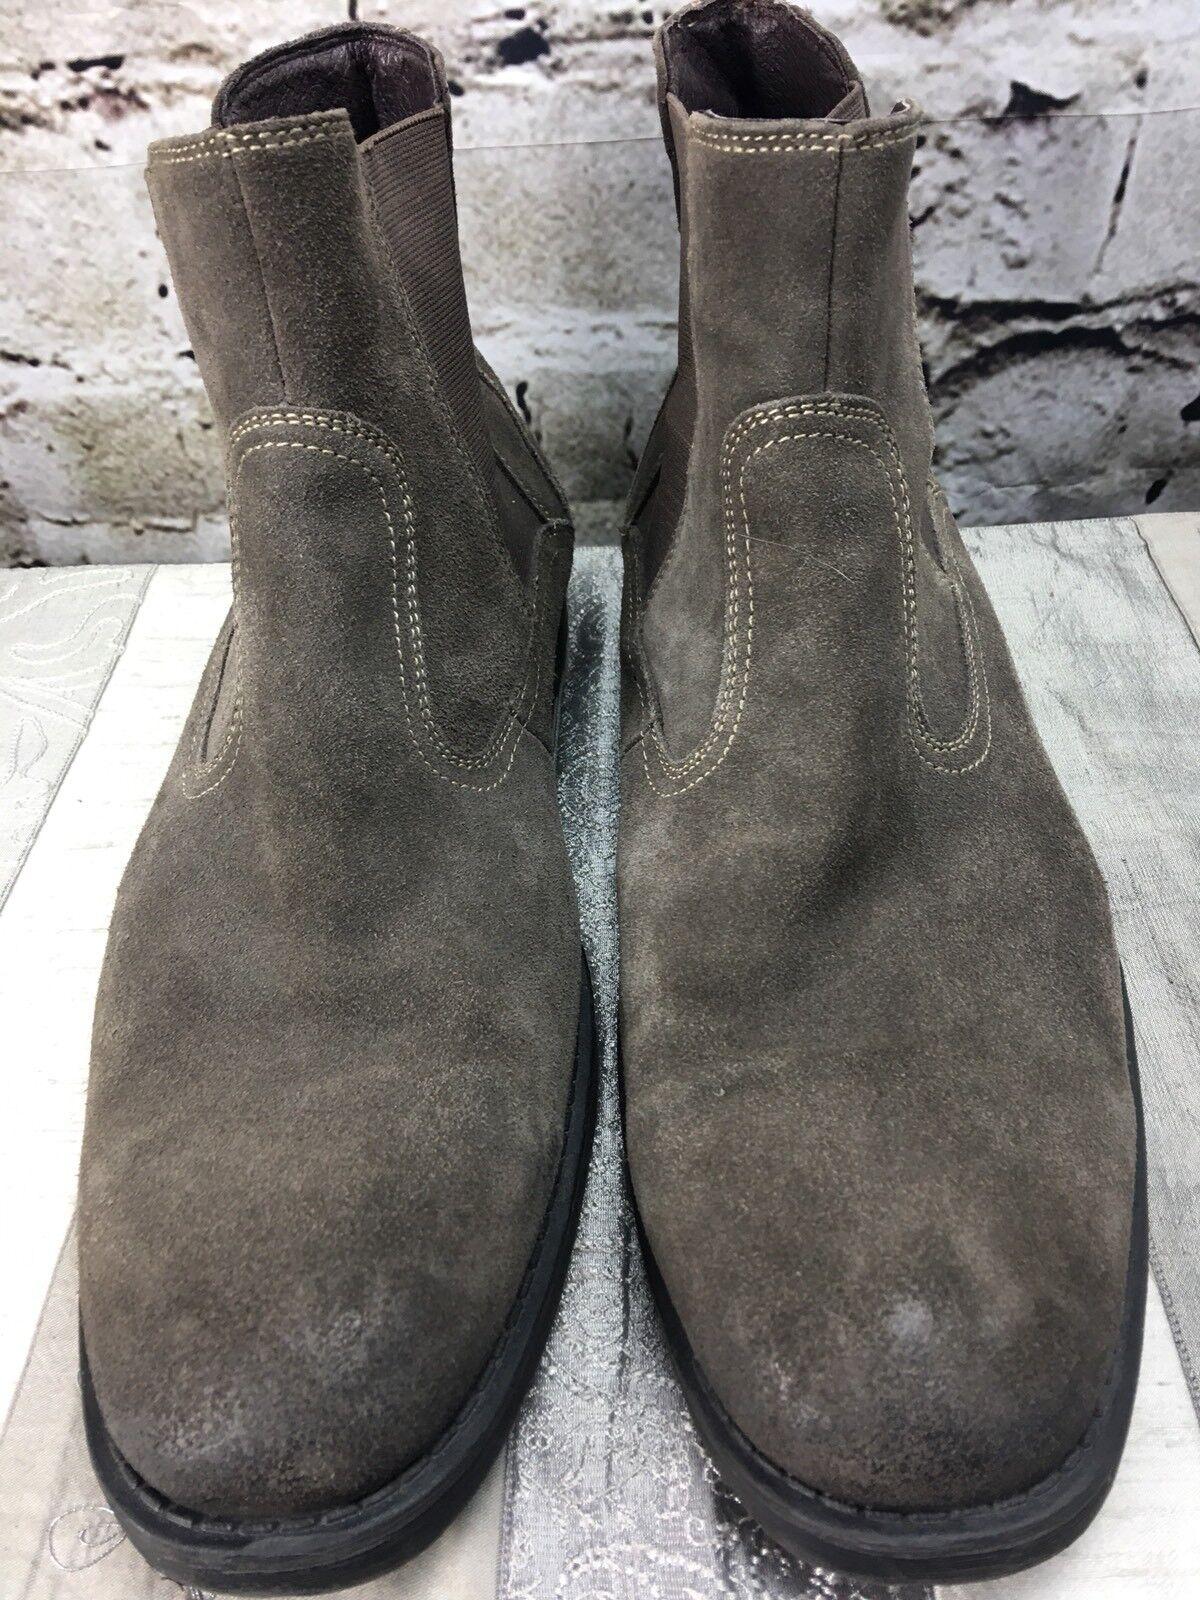 J Murphy Men Pull On Brown Boots Sz 13 M